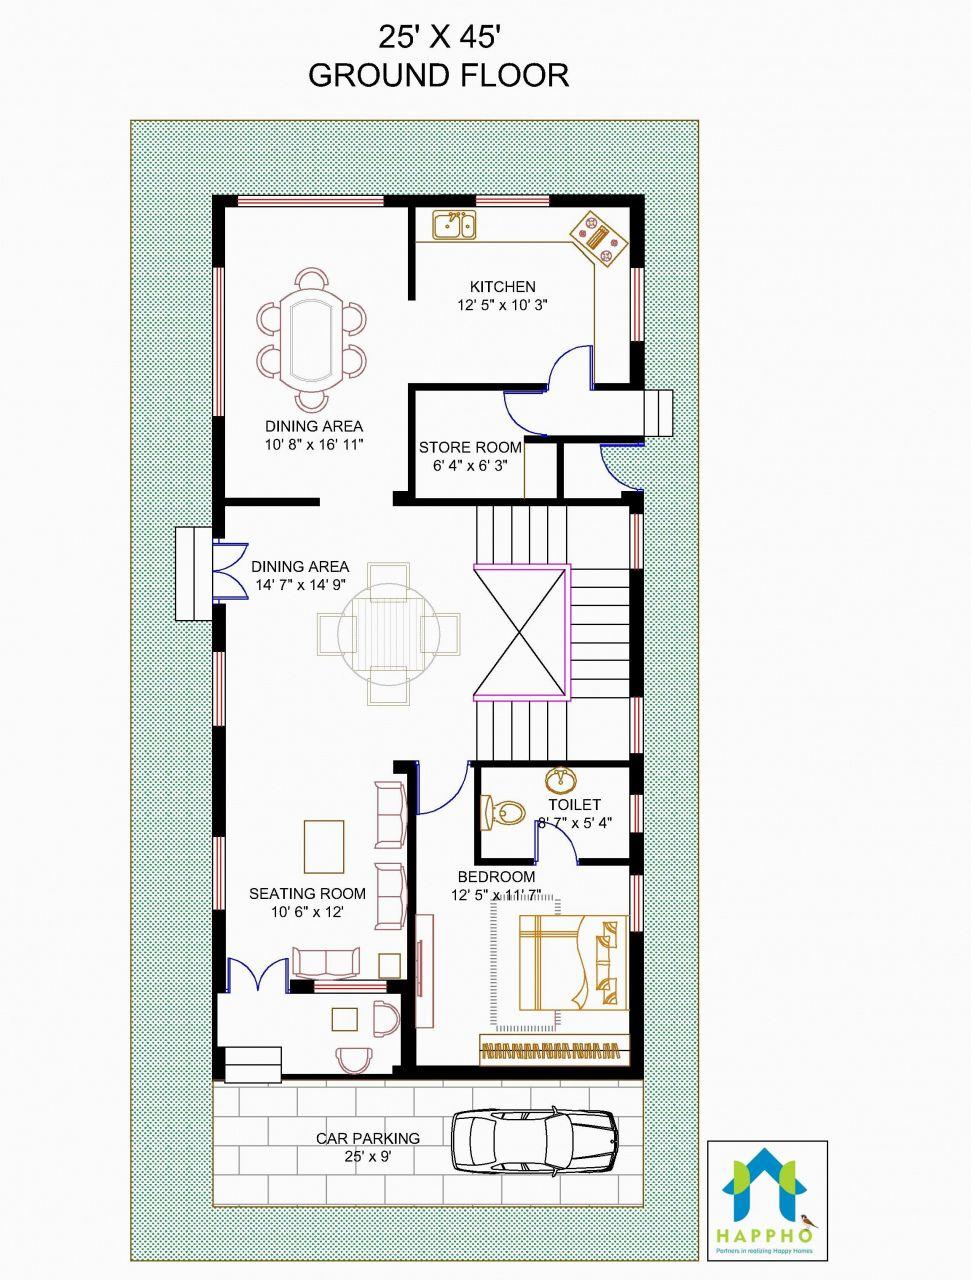 20 Summerfield Designs House Plans 2017 Shop House Plans Duplex House Plans Metal Building House Plans